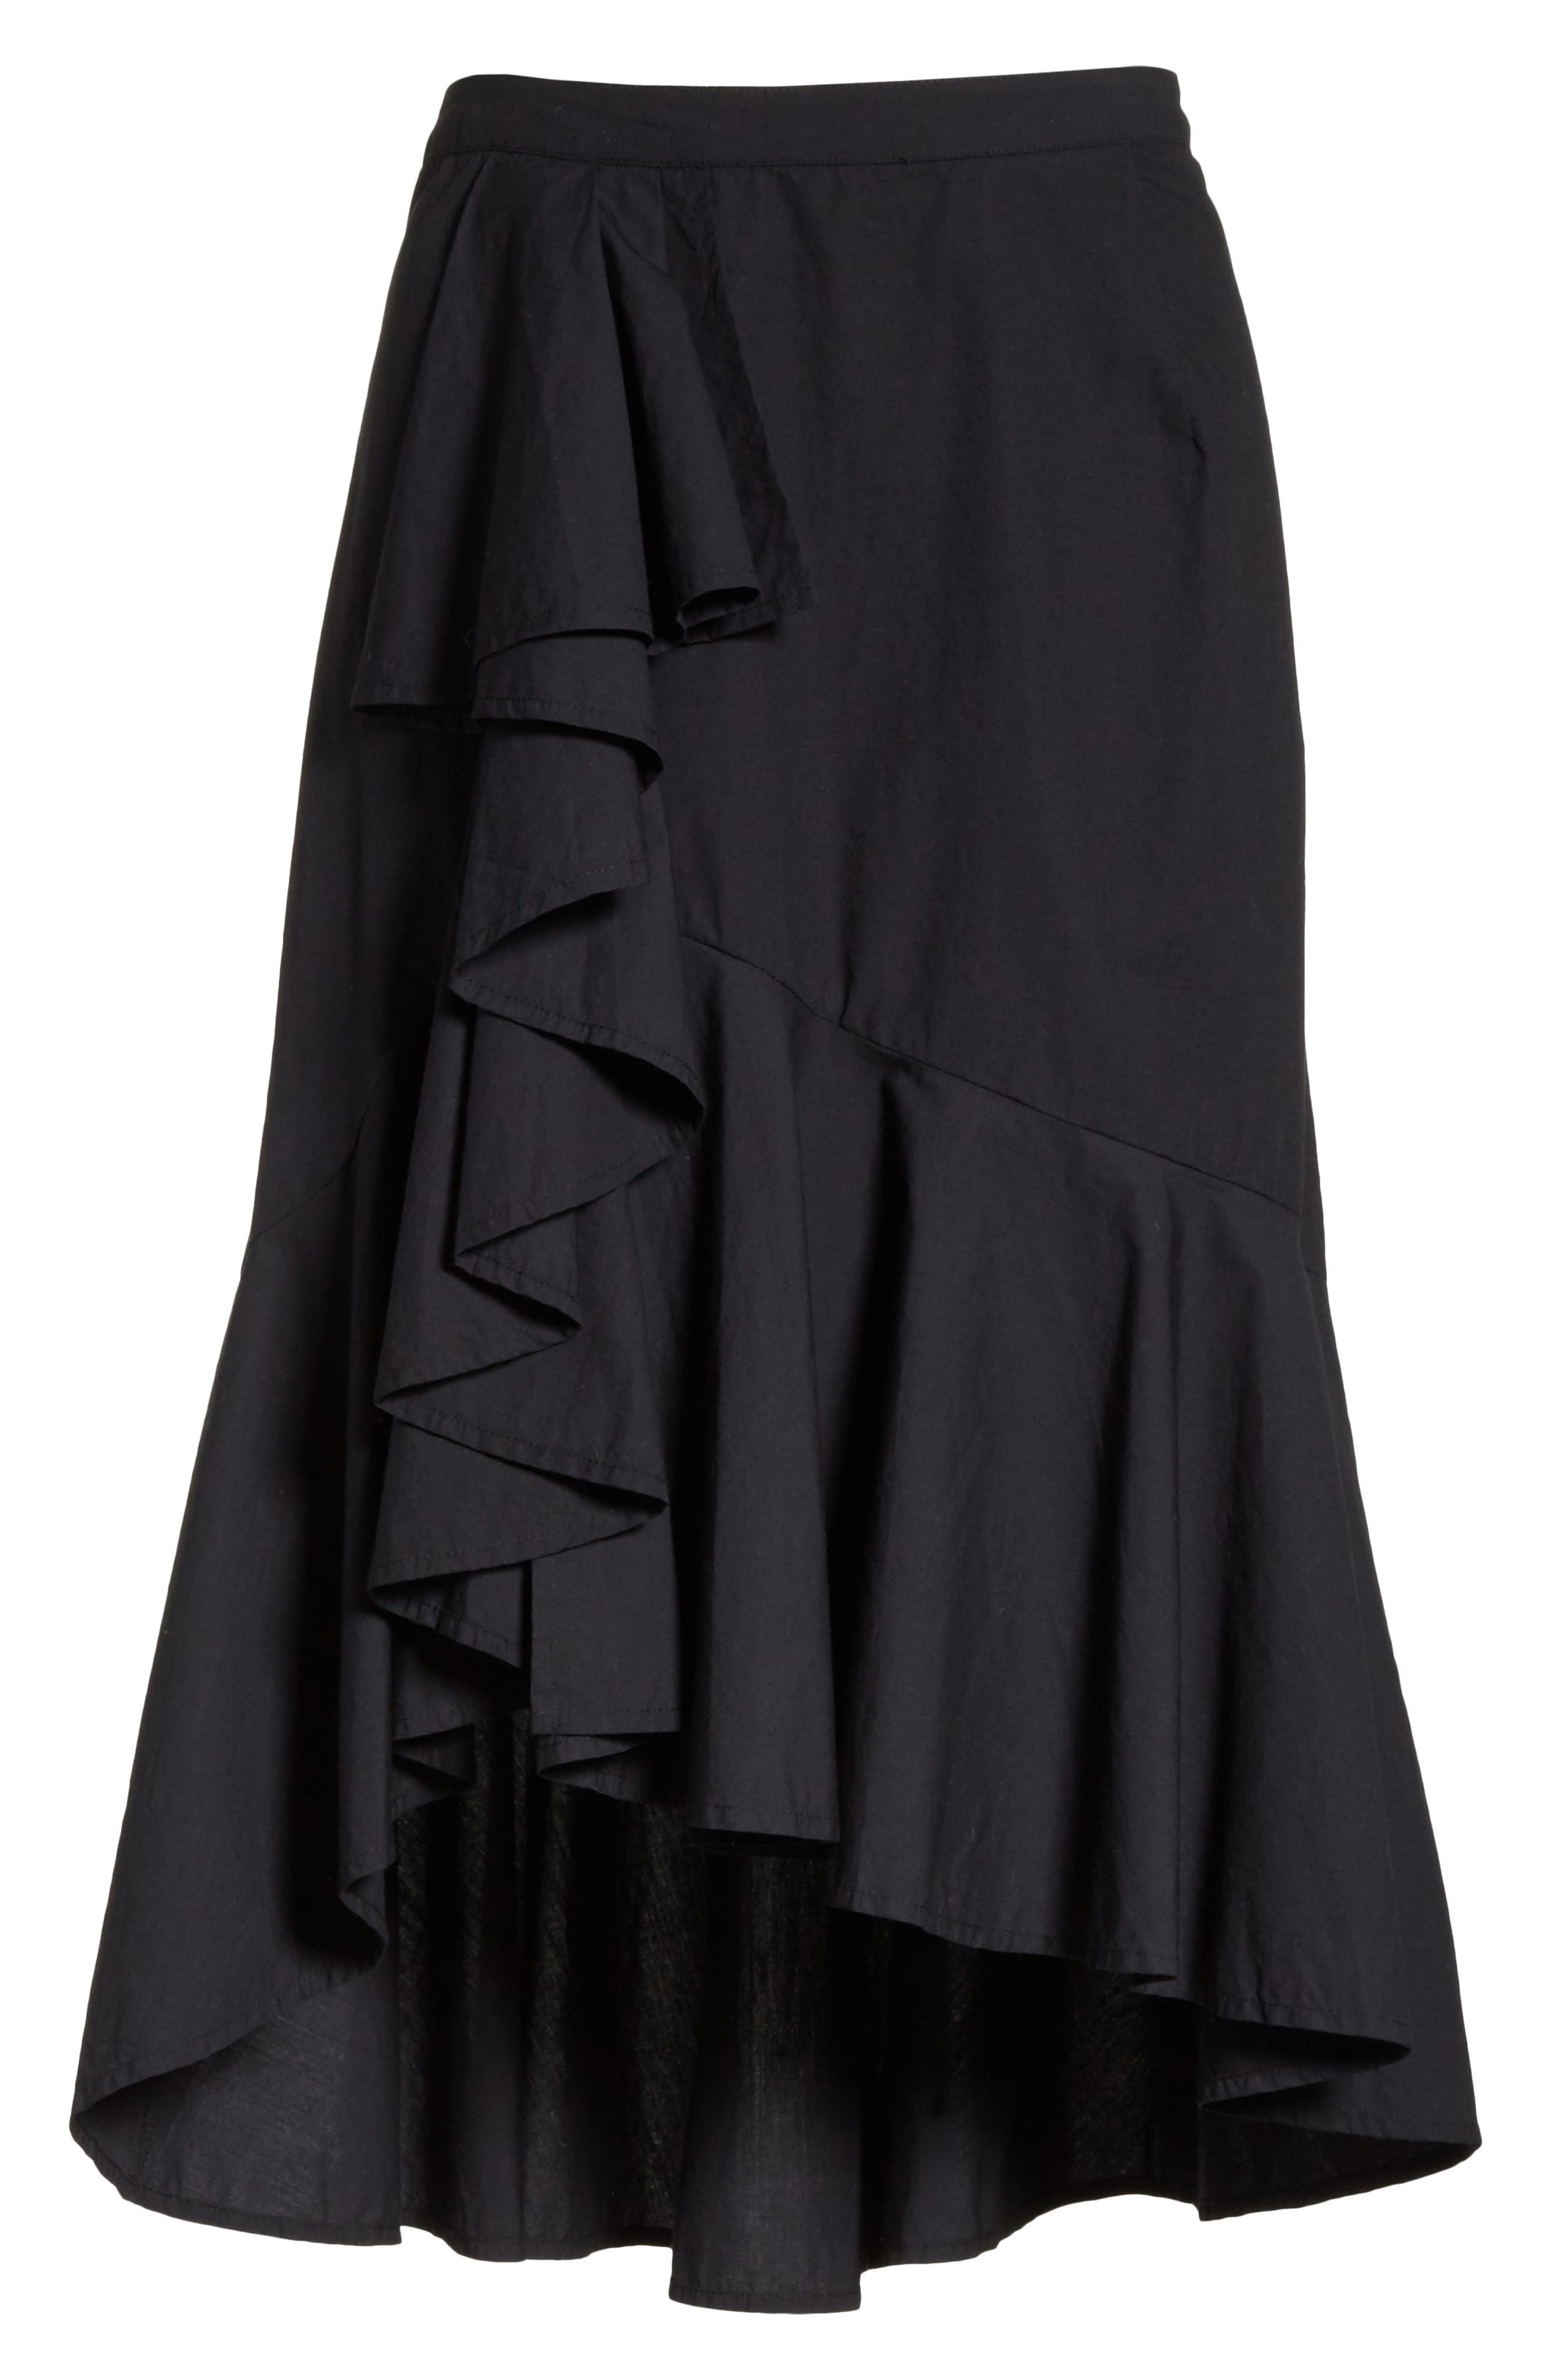 Chesmu Ruffled Cotton Skirt,                             Alternate thumbnail 6, color,                             001